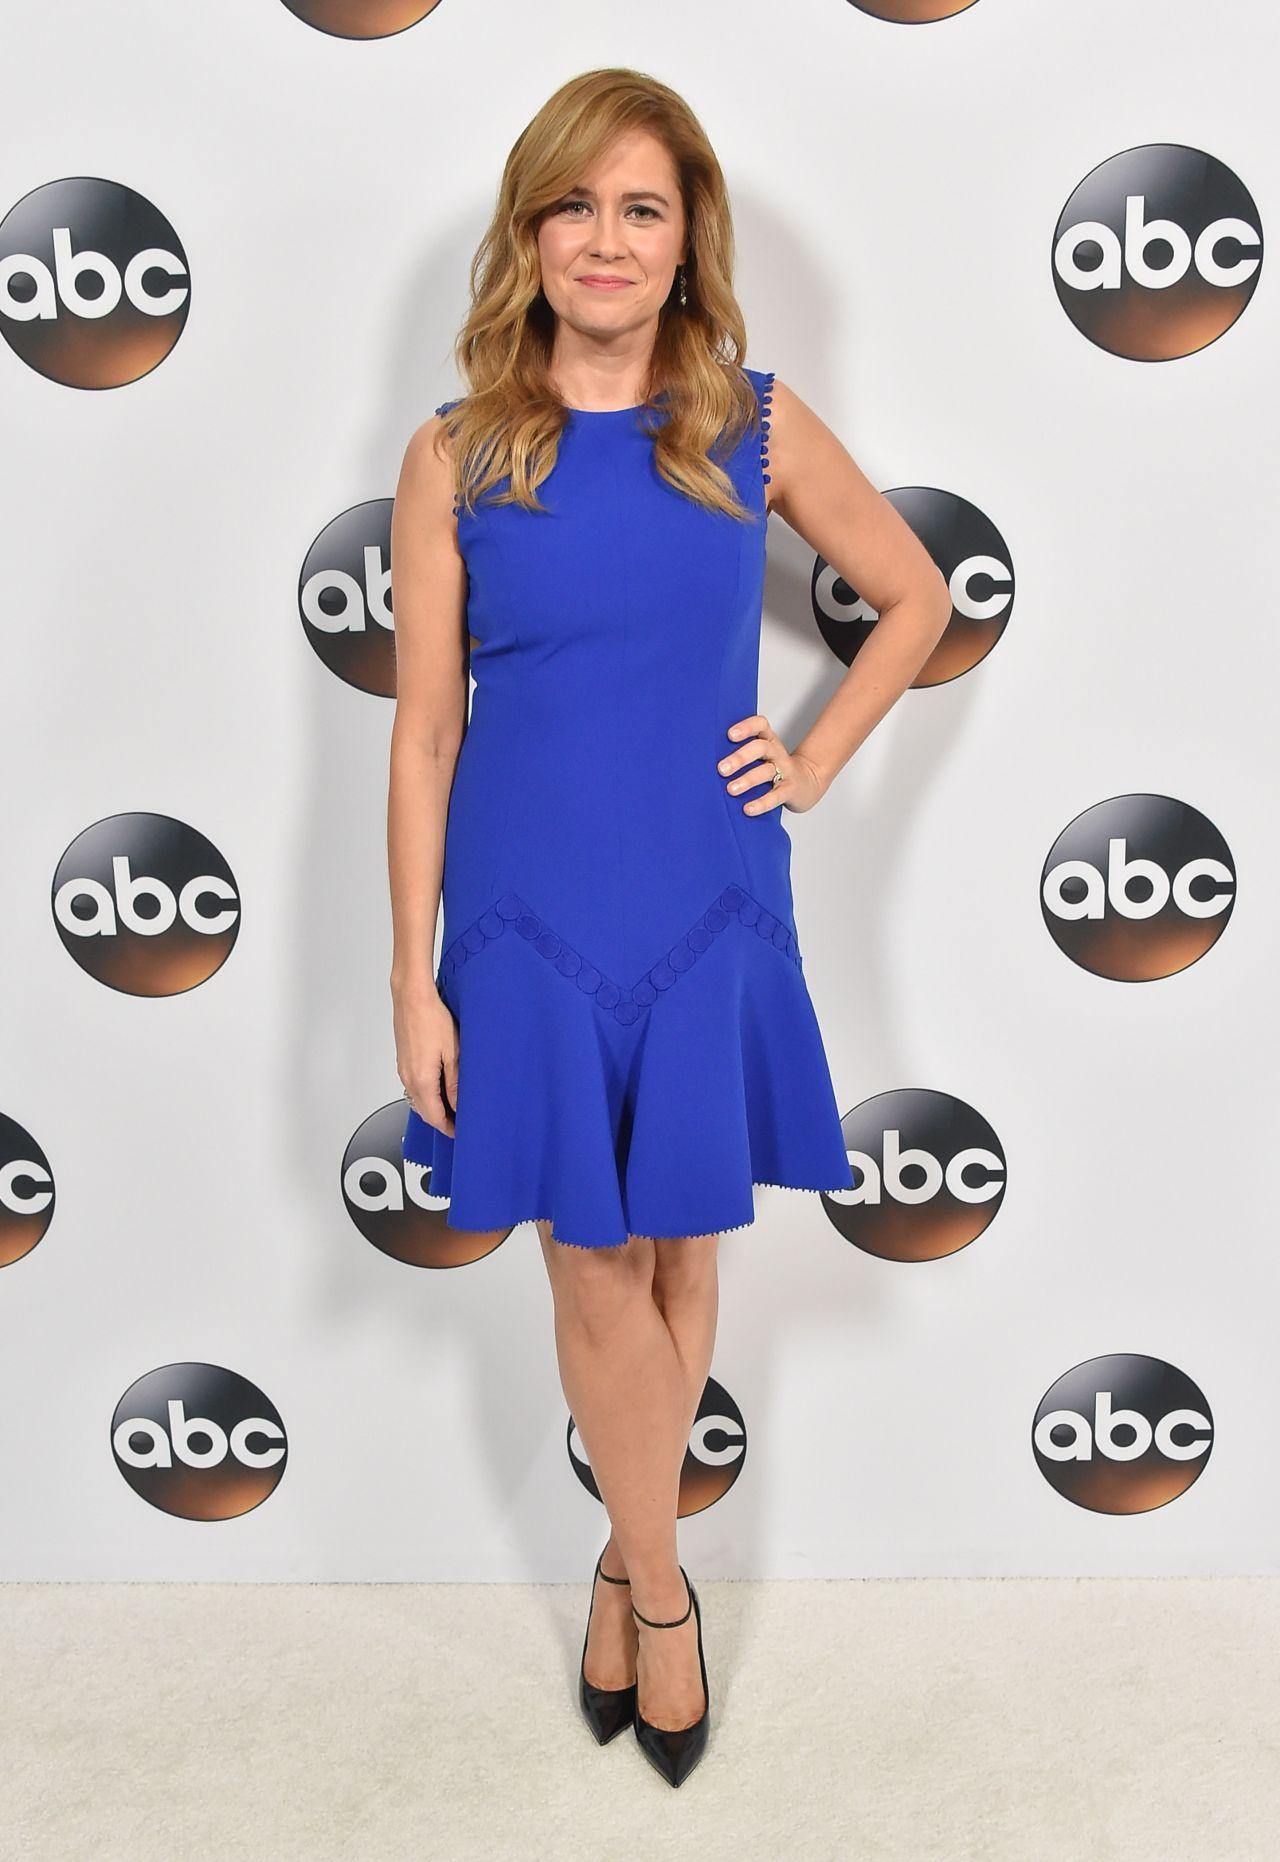 82d59975eeeca Jenna Fischer – ABC All-Star Party in LA